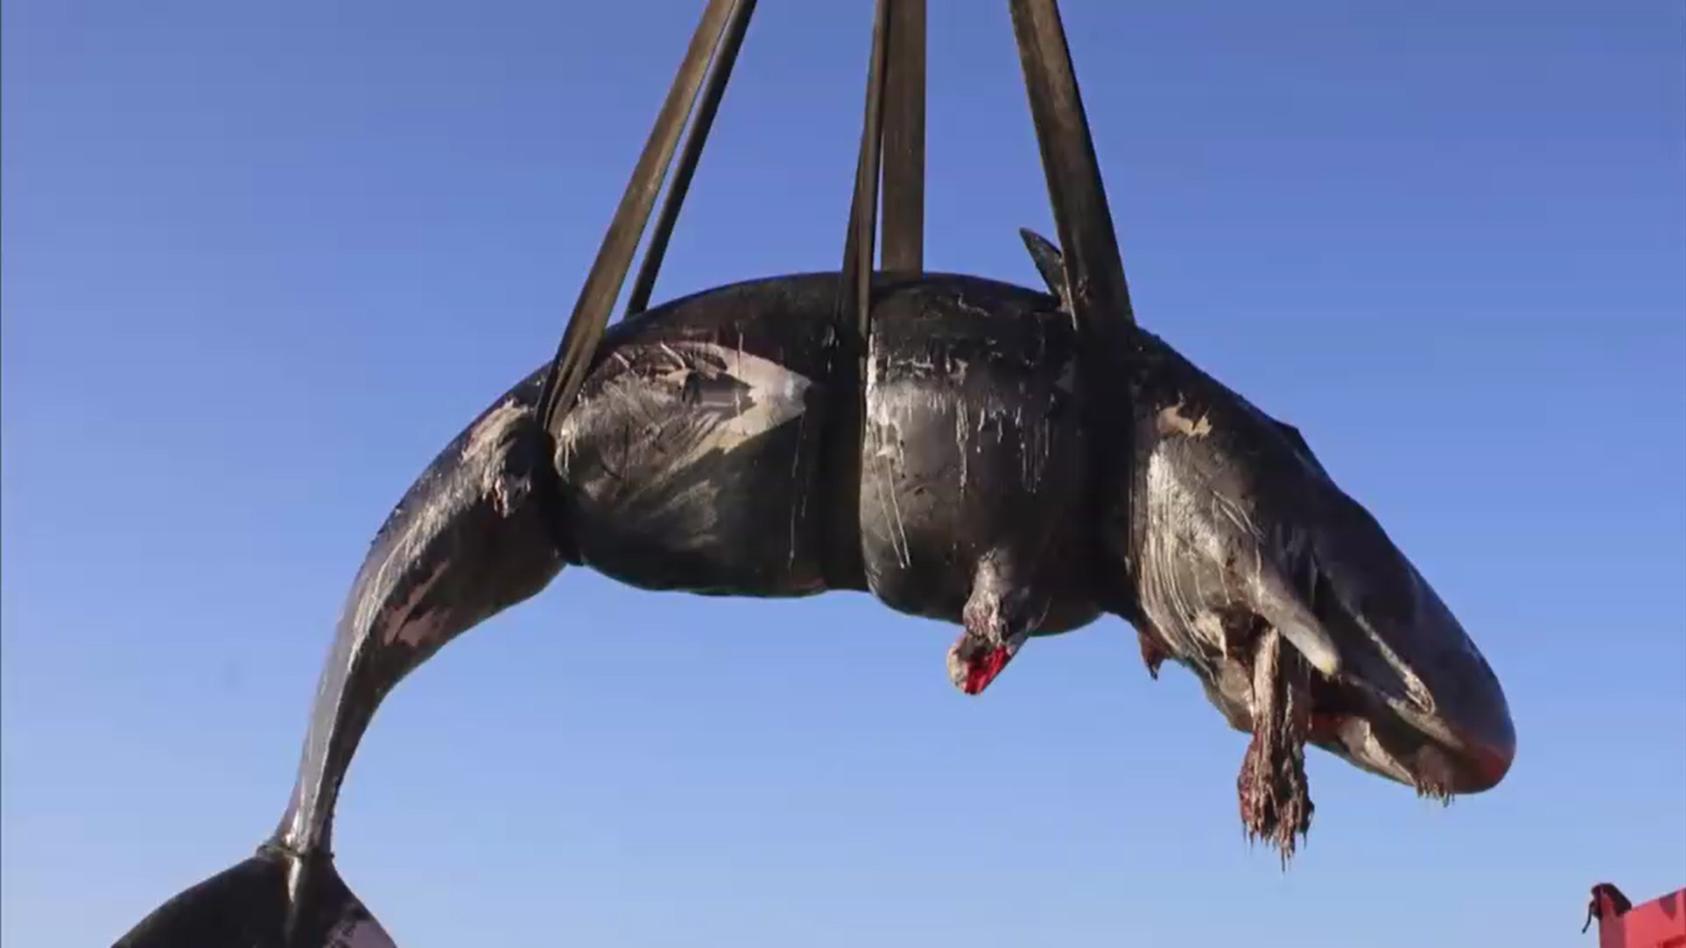 Schwangerer Wal gestrandet.